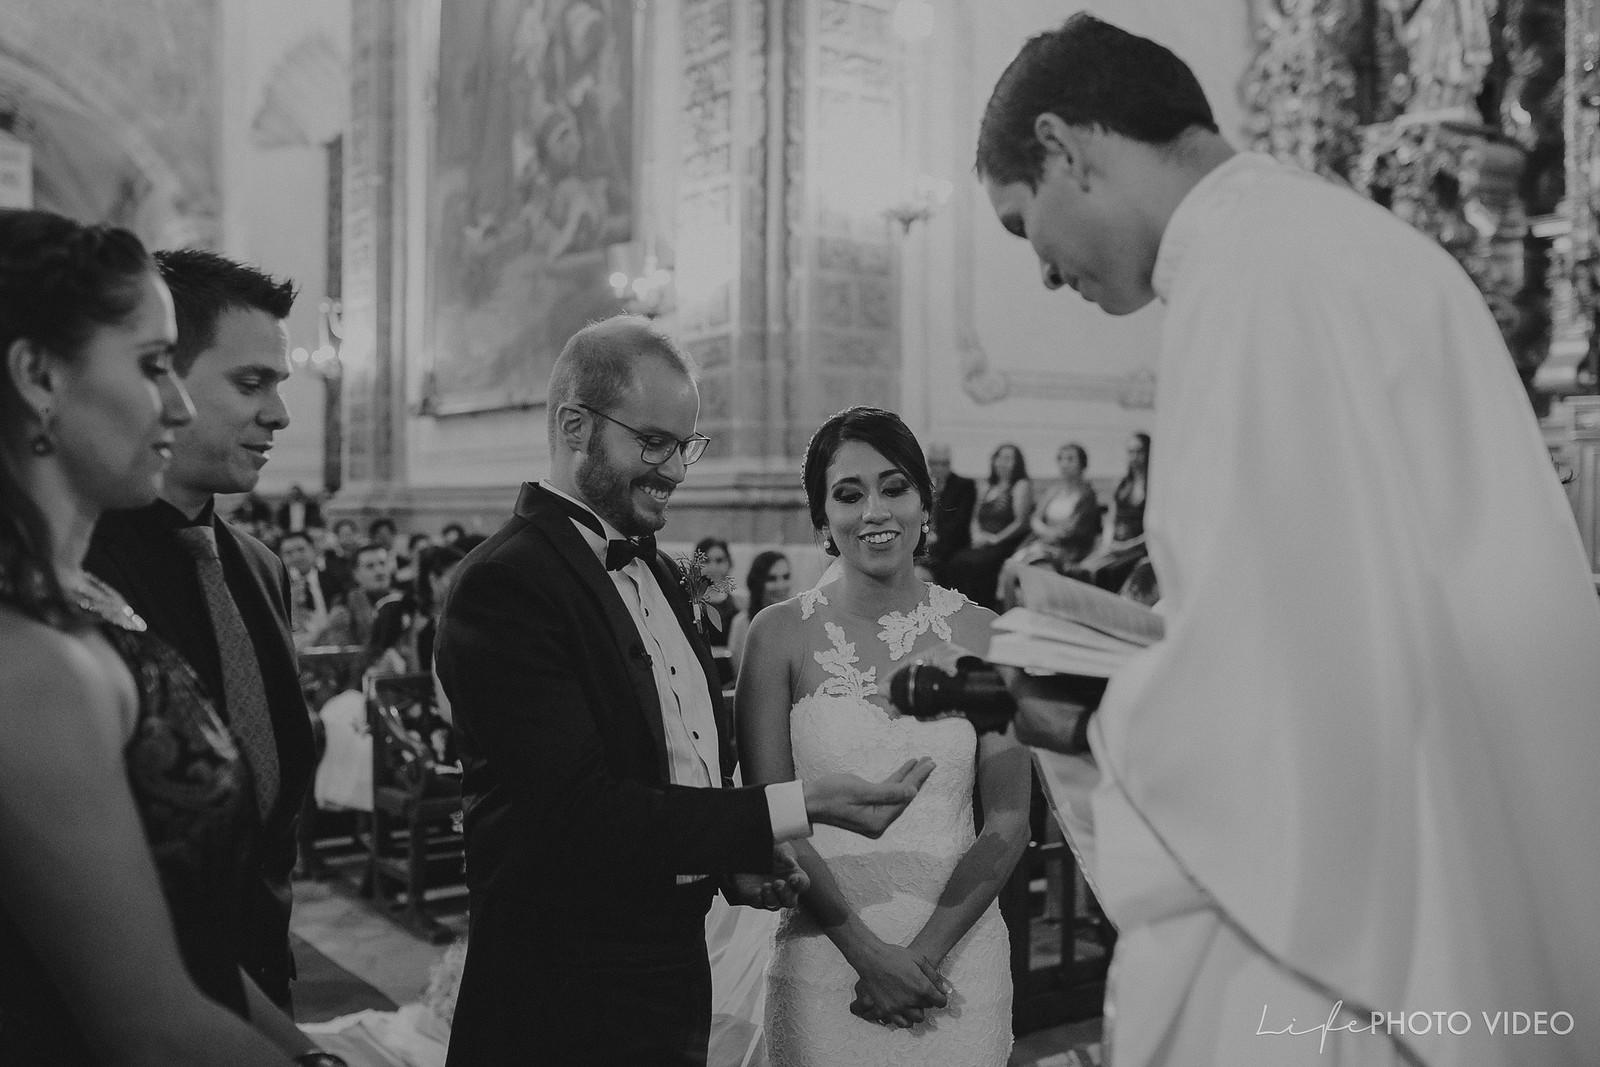 LifePhotoVideo_Boda_Guanajuato_Wedding_0041